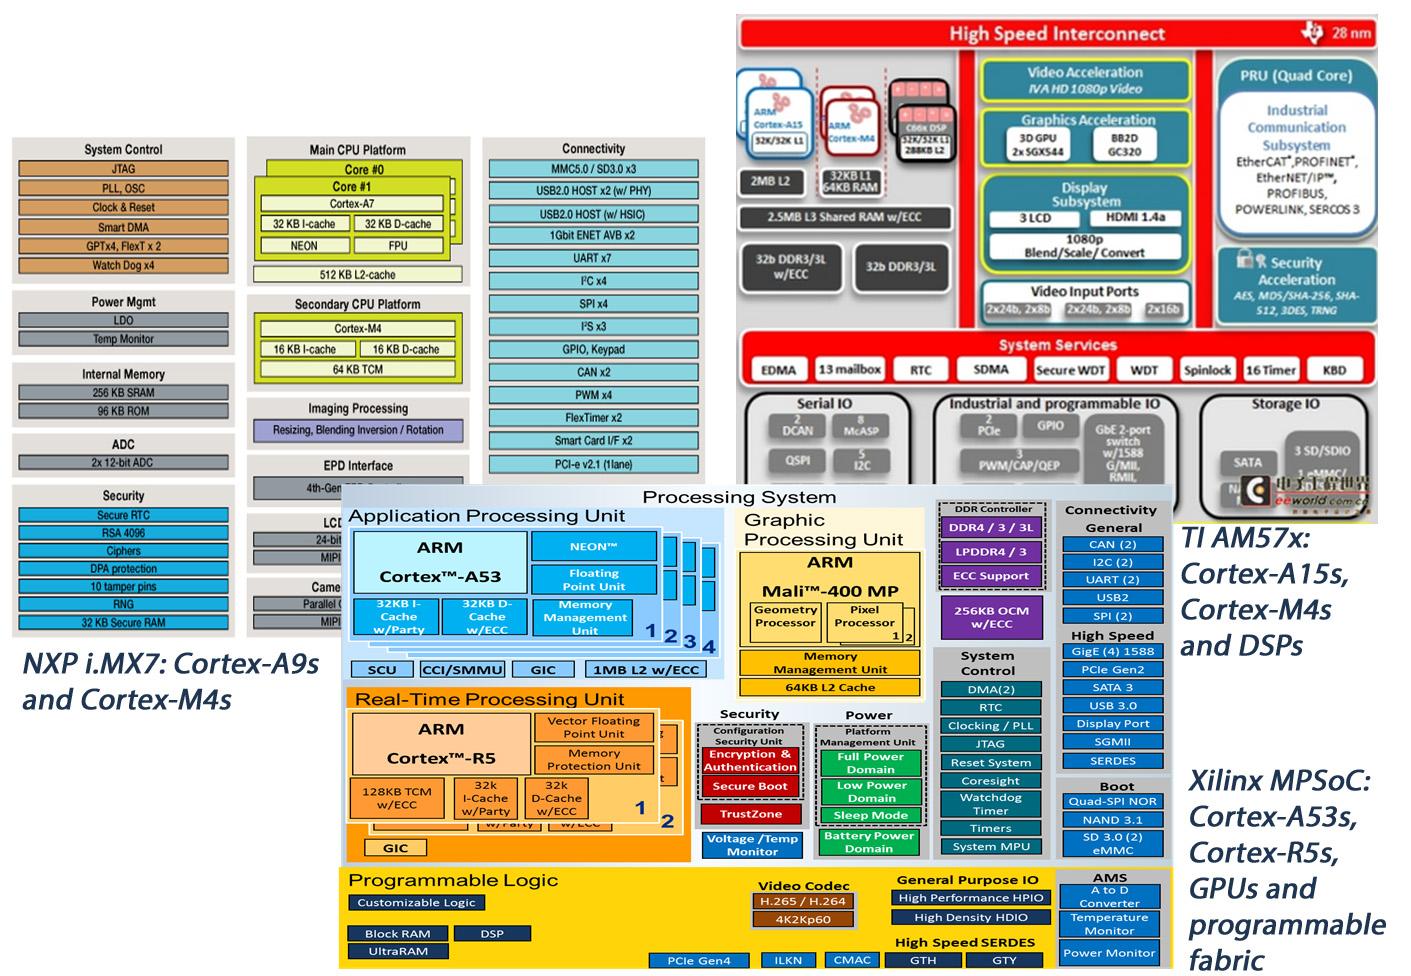 Embedded Software Platform Enables Convergence on Industrial